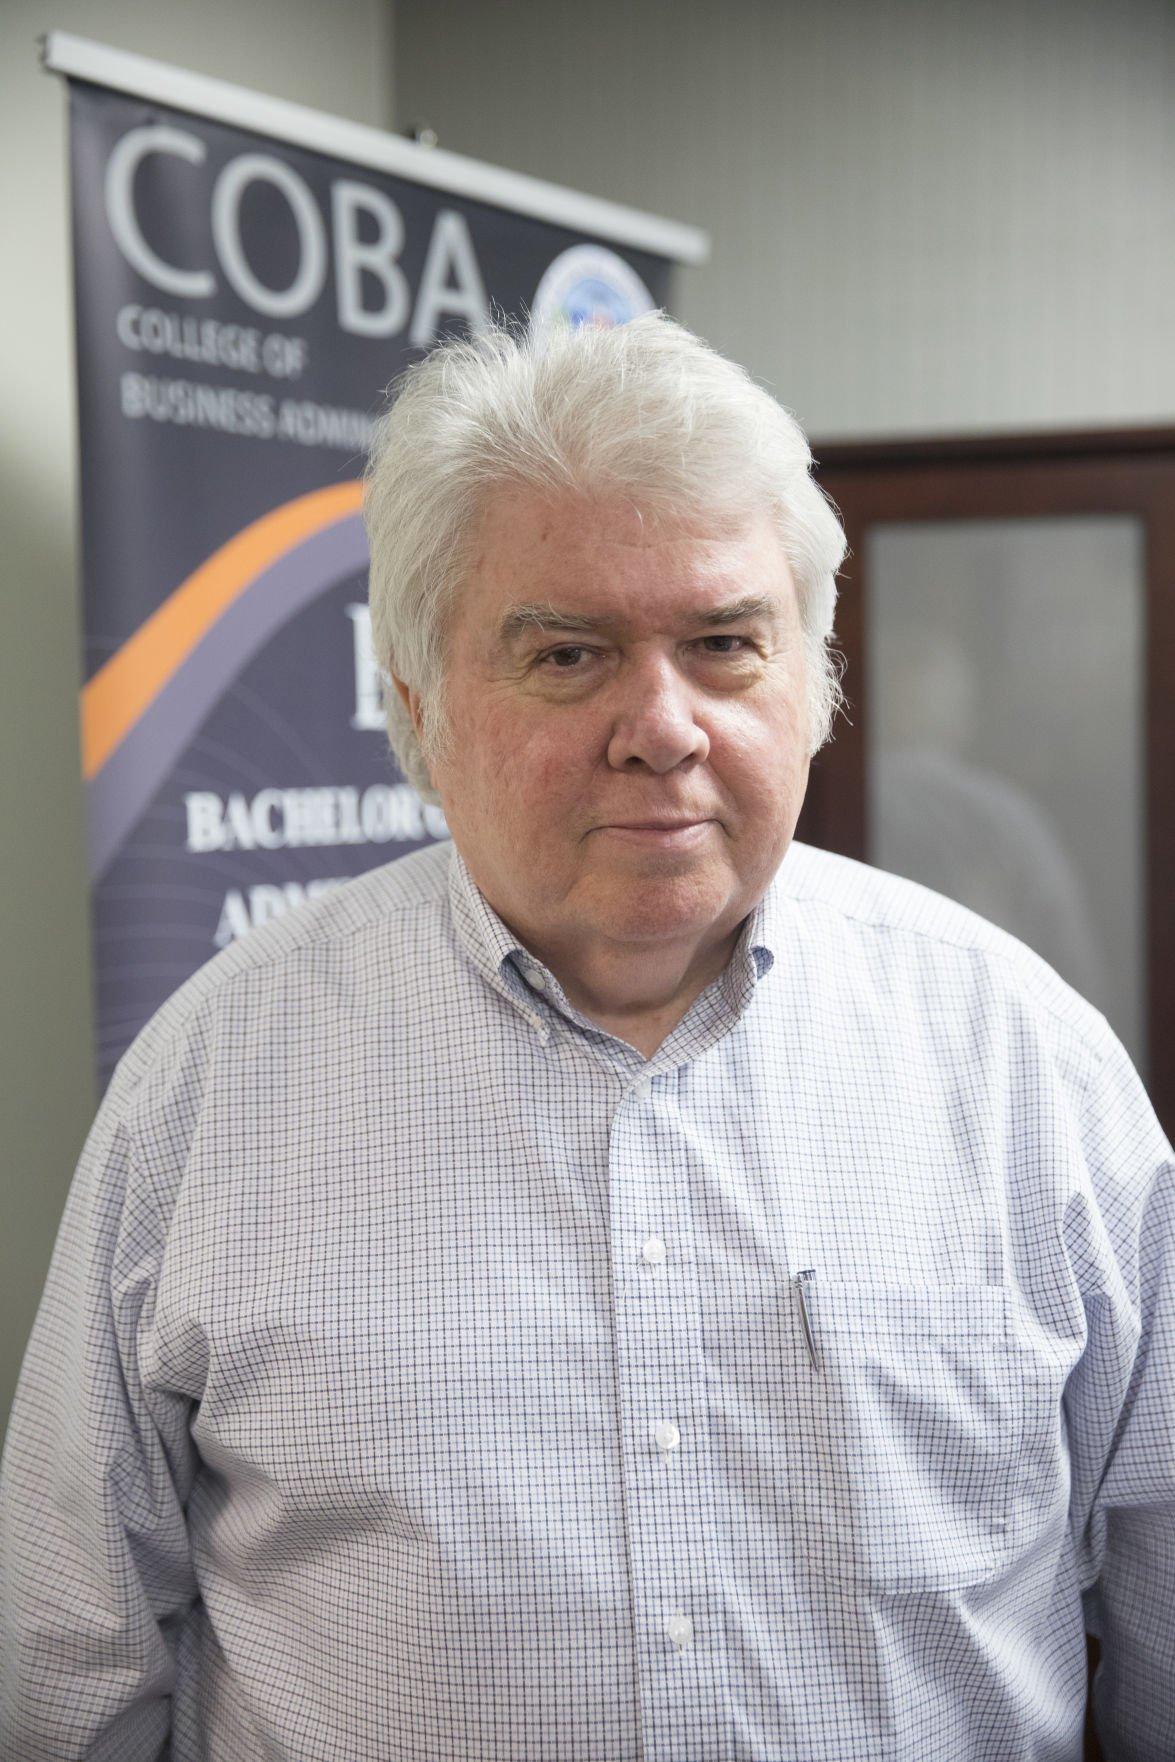 Bob Nachtmann